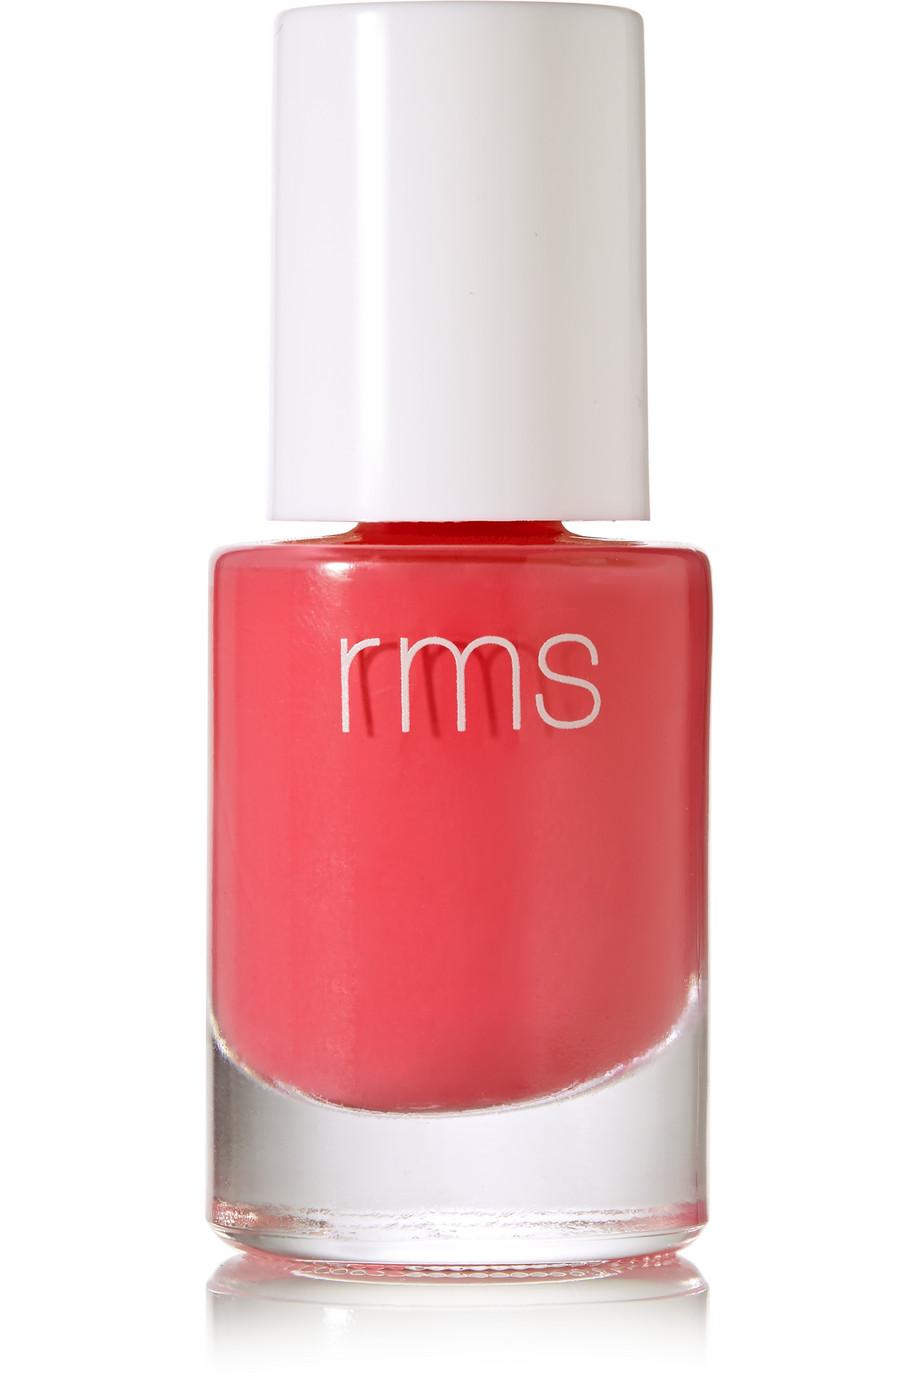 Nail Polish - Killer Red, by RMS Beauty